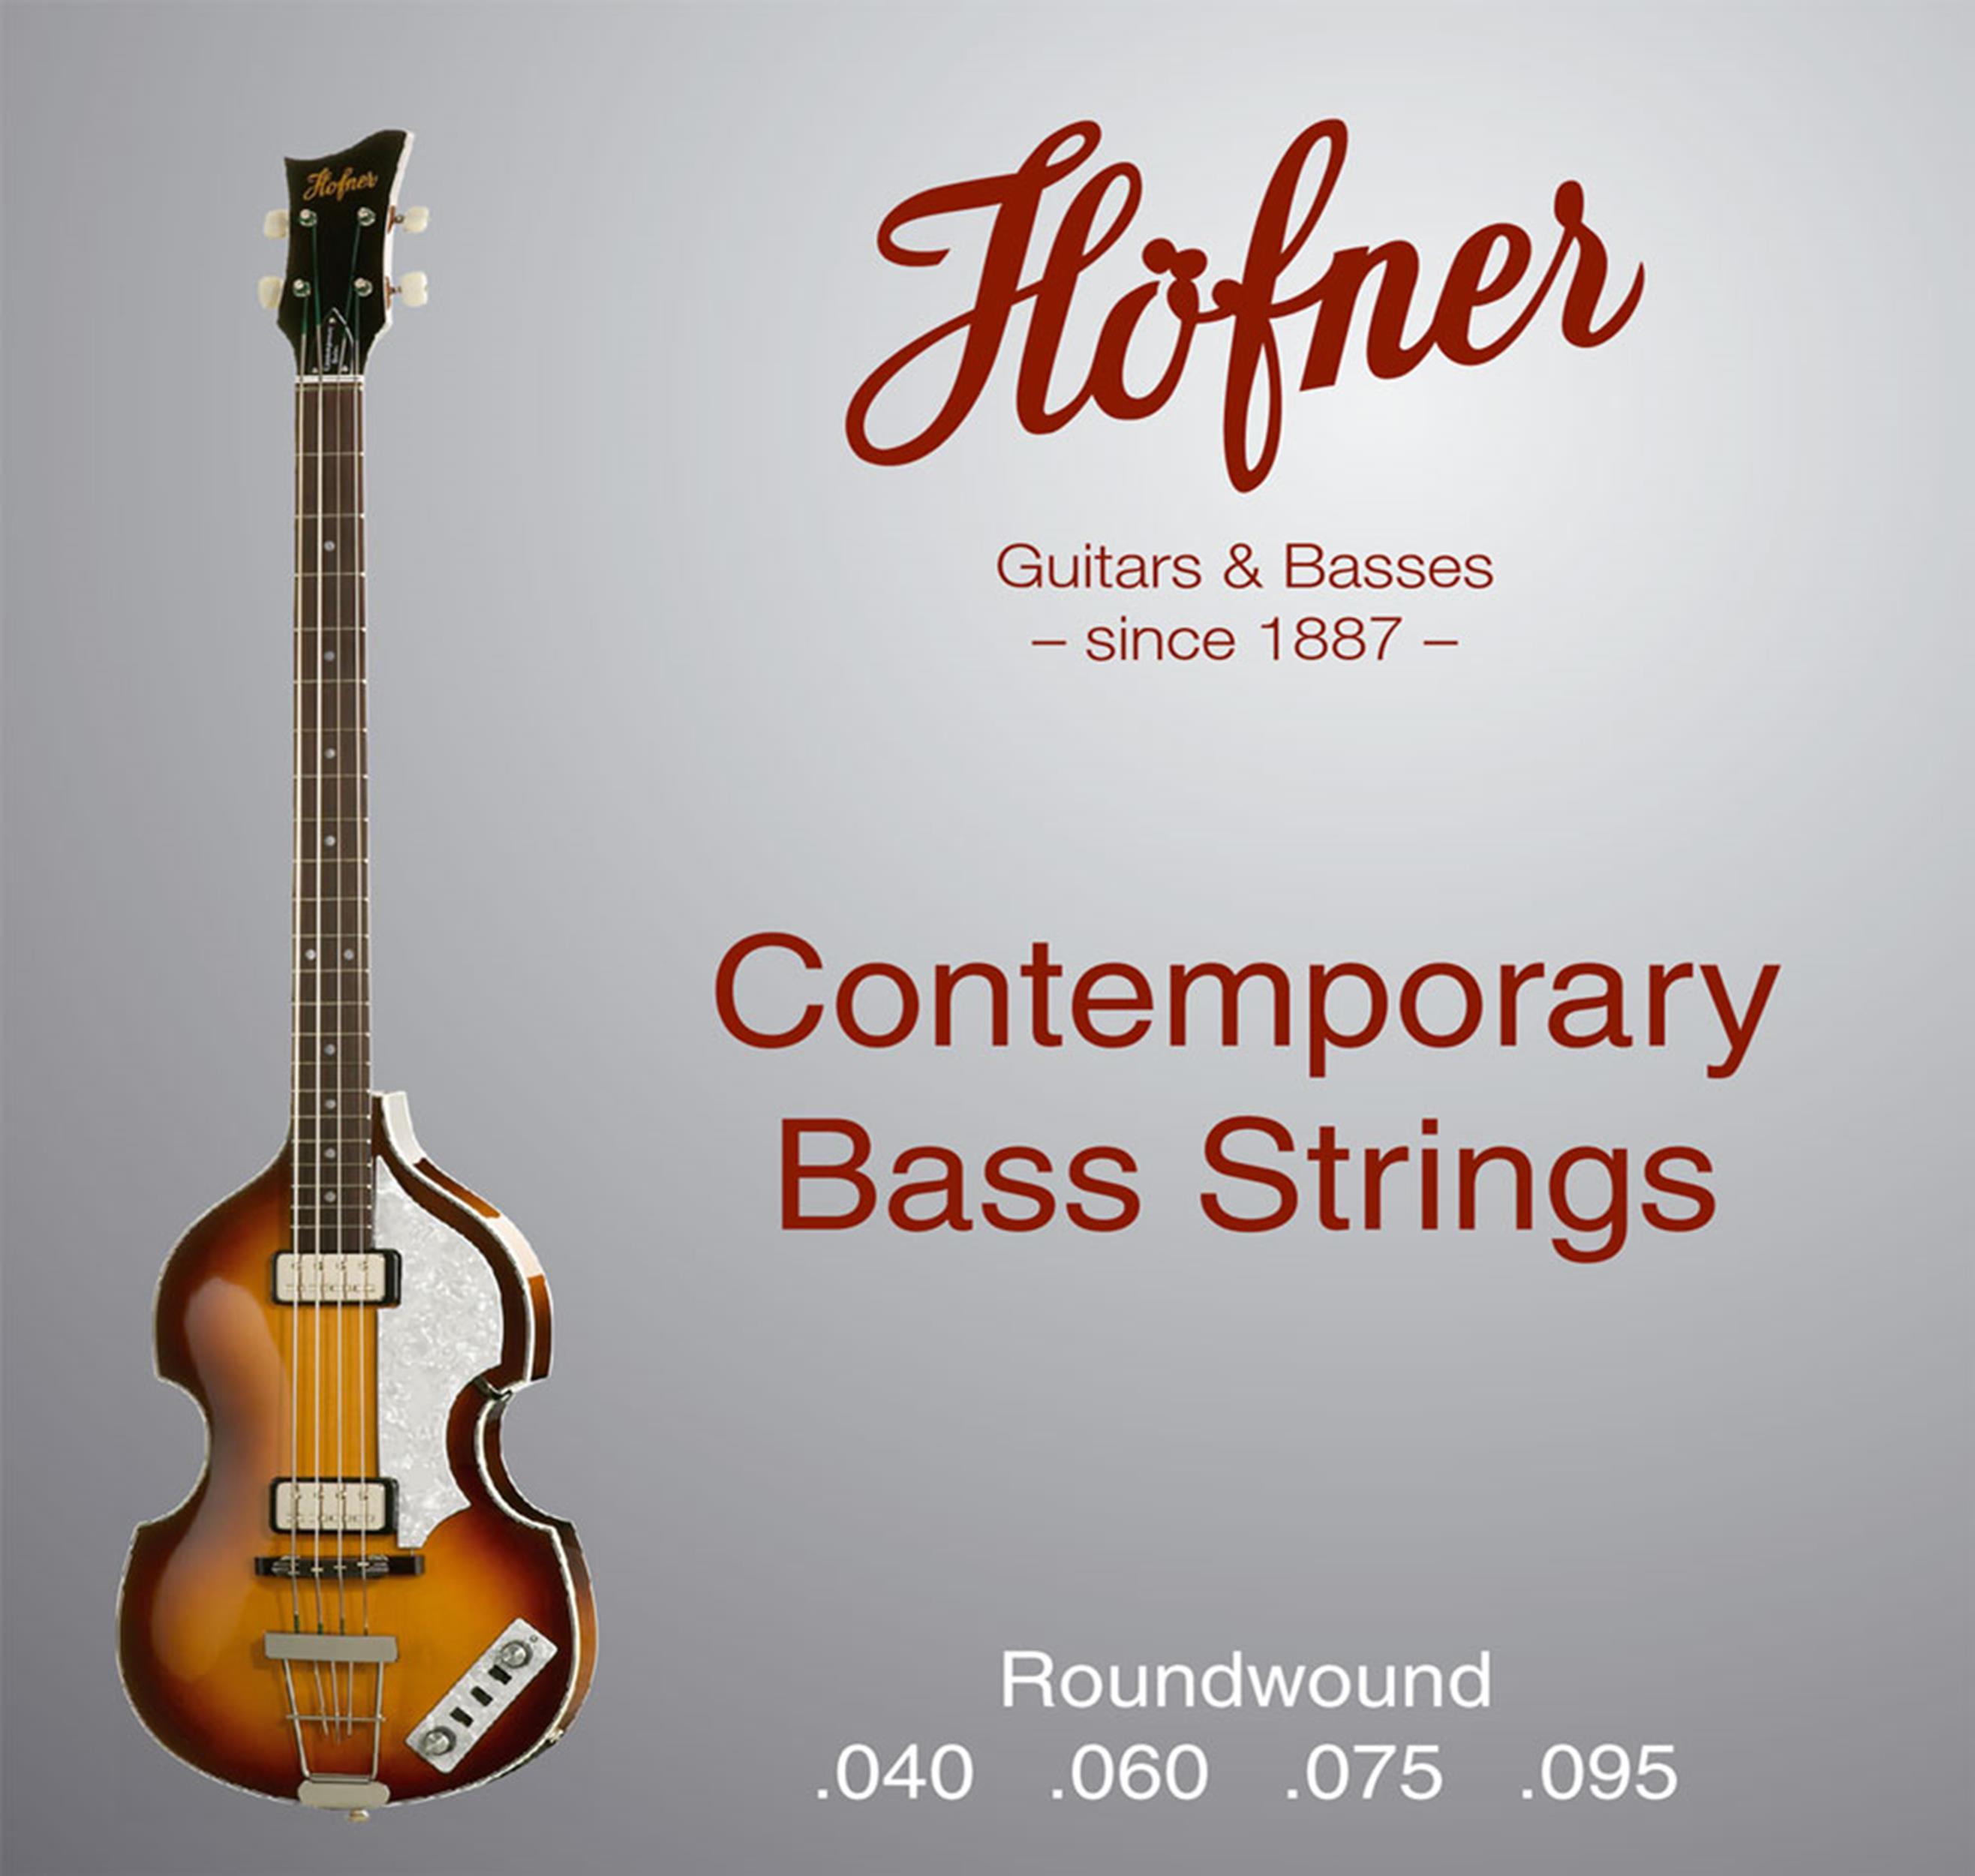 HOFNER-HCT-1133-R-ROUNDWOUND-CORDE-VIOLIN-BASS-CONTEMPORARY-STRINGS-sku-5542